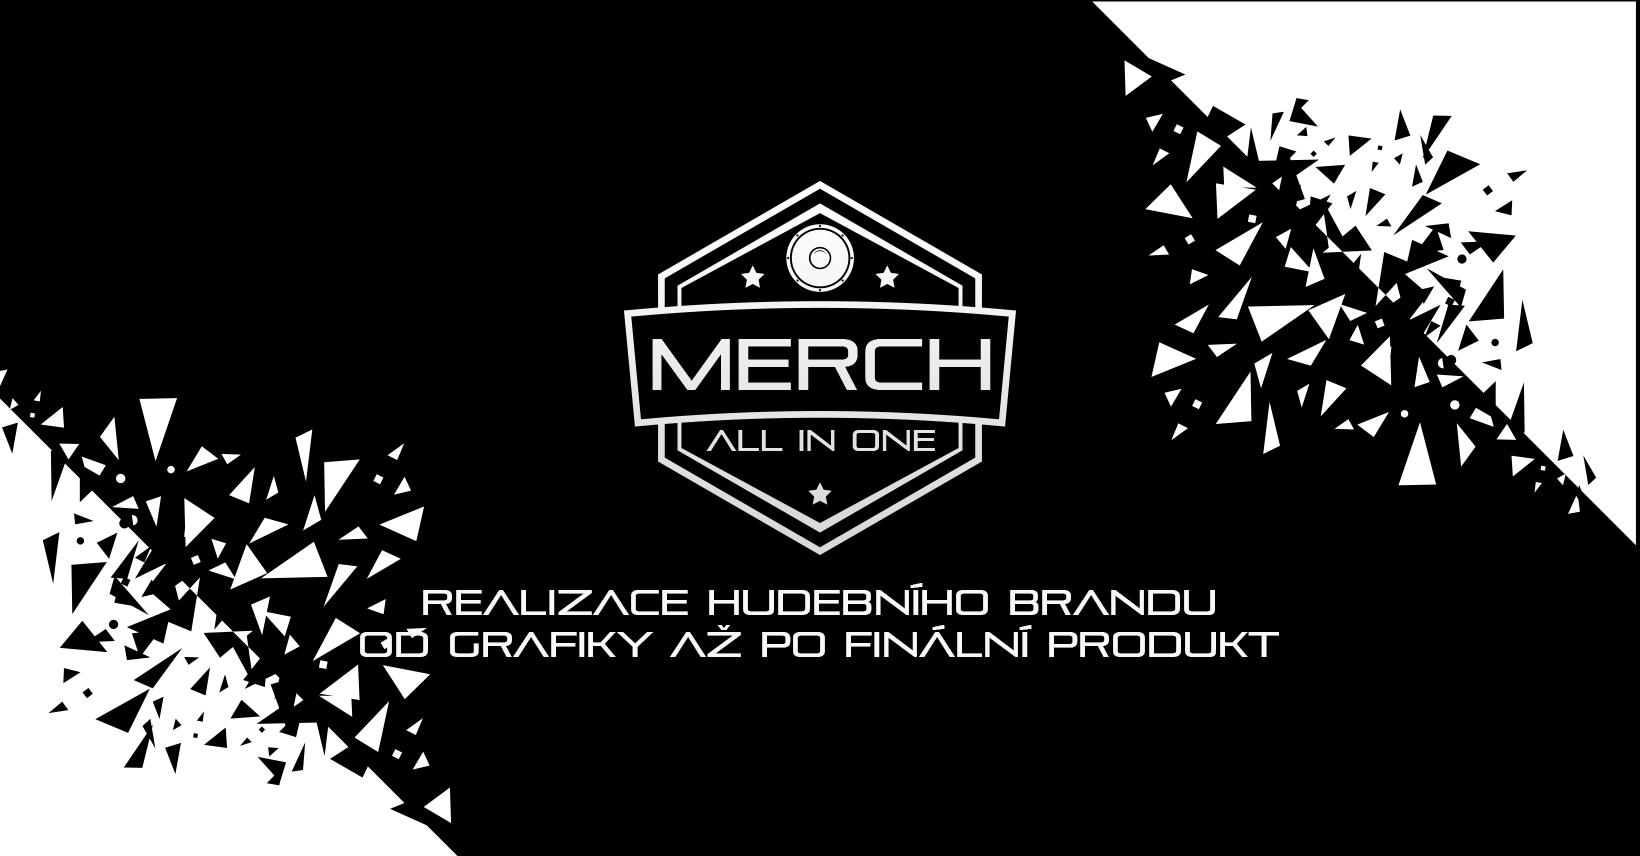 ZAKÁZKOVÉ SLUŽBY -  prodej merche / fotograf / hostesky / doprovodný program / tvorba webu / marketing / grafika